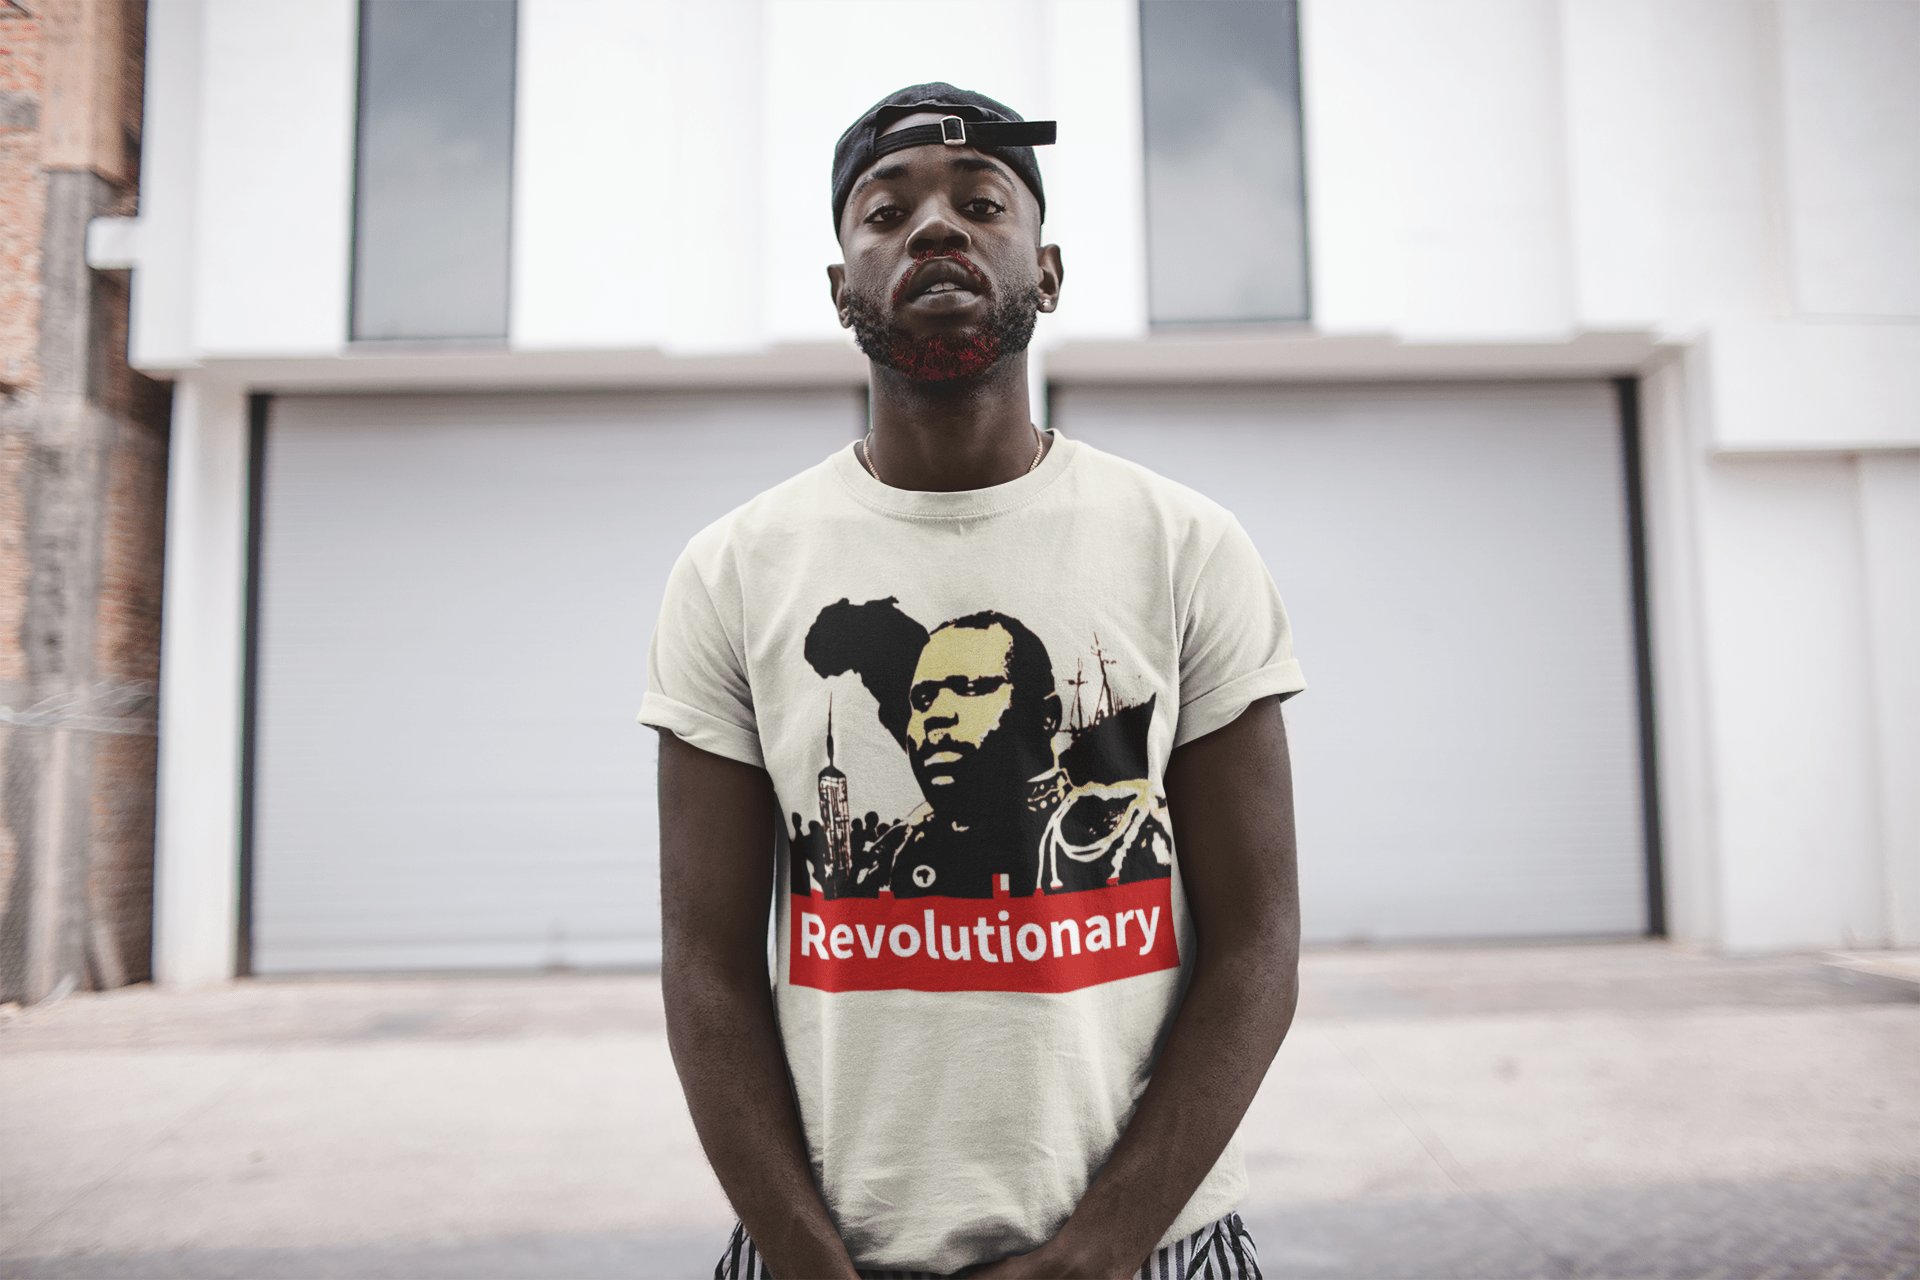 t-shirt-mockup-of-a-man-with-an-attitude-in-an-urban-scenario-21681